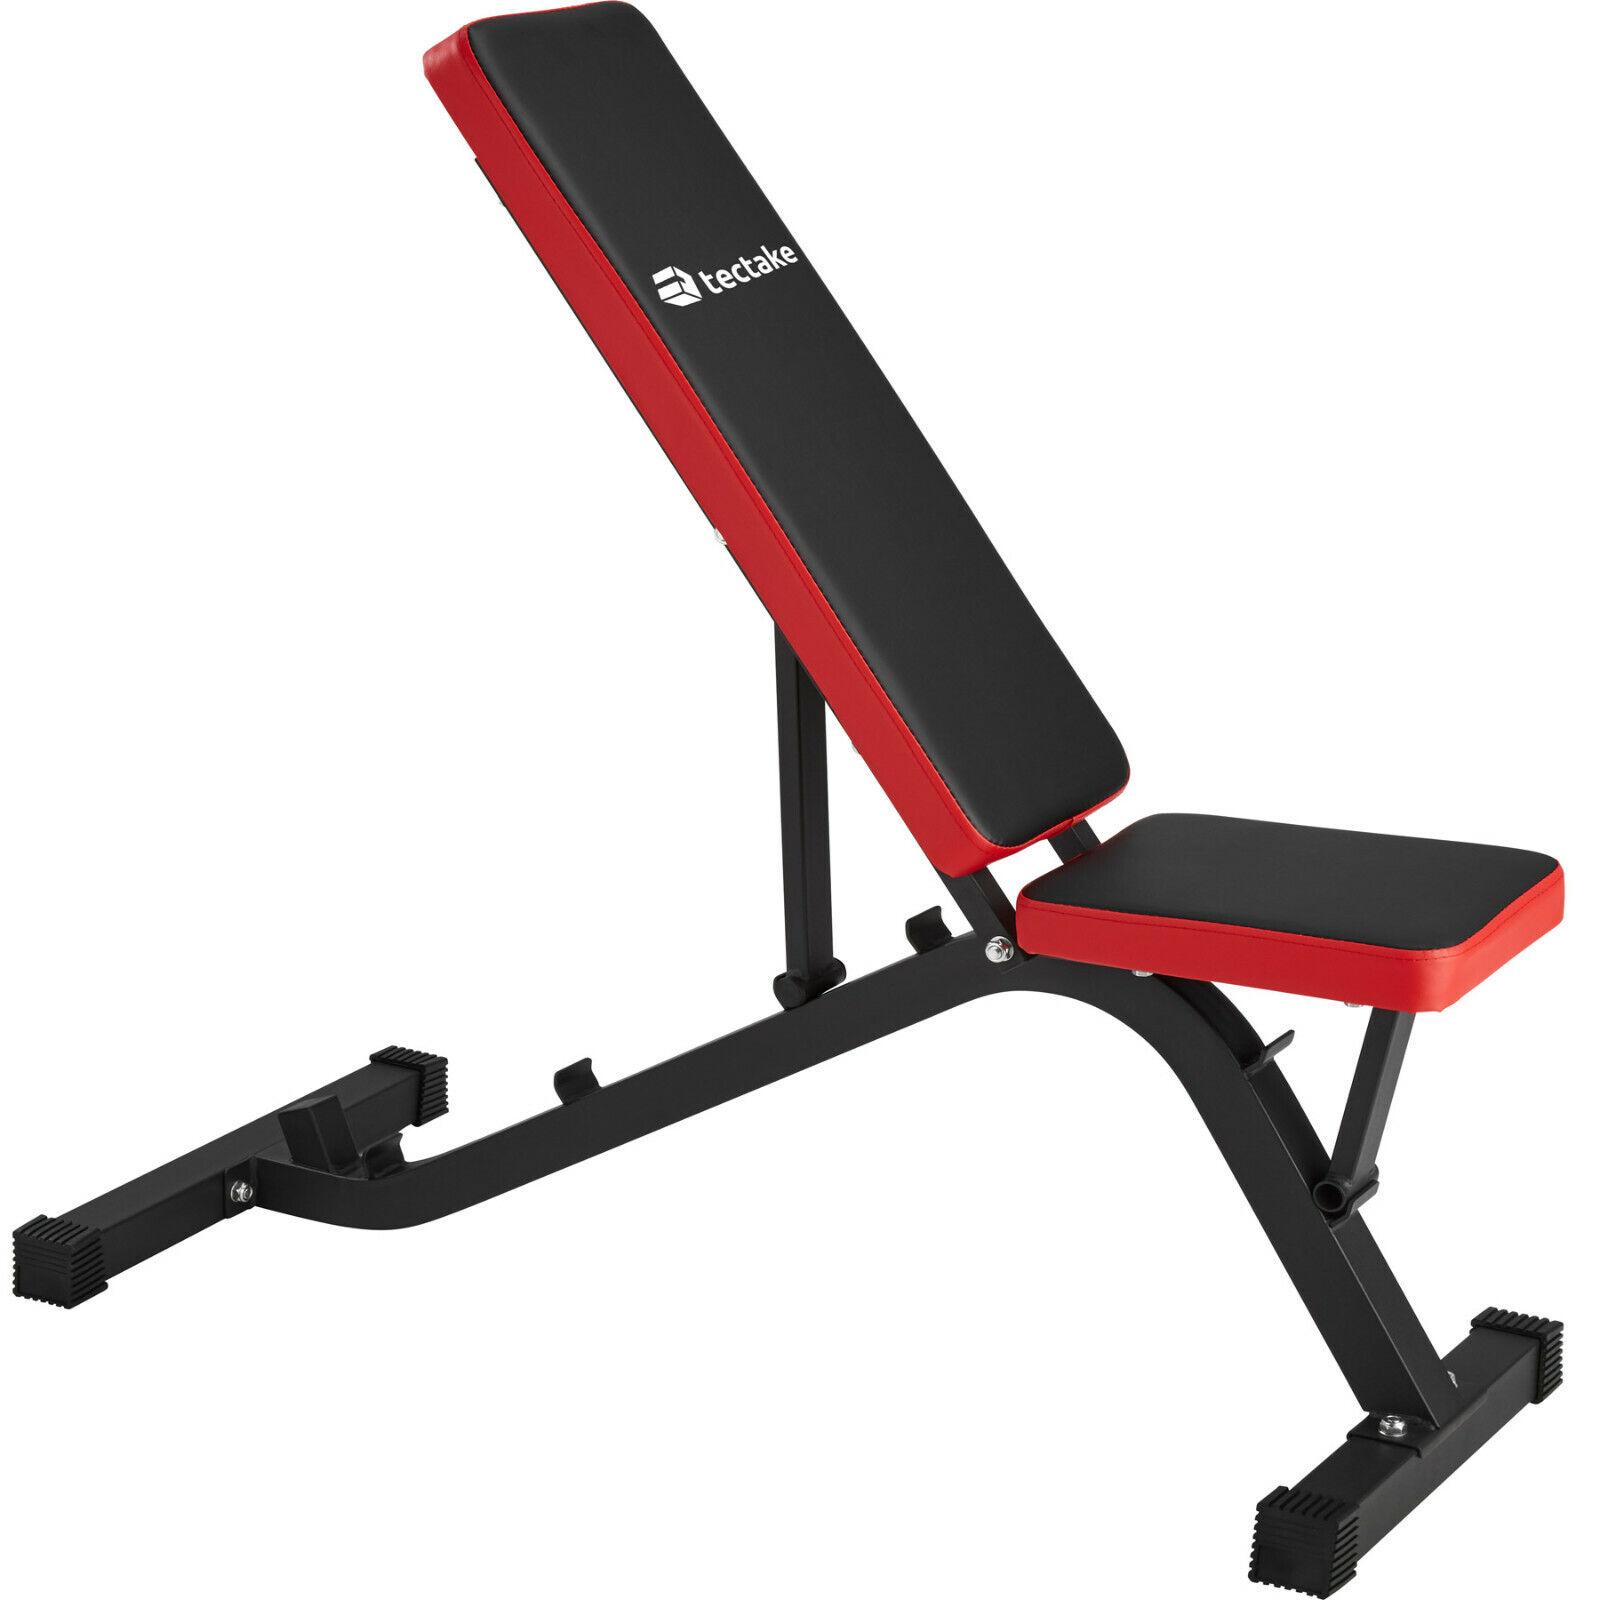 Regolabile panca multiangolare allenamento body panca piana fitness universale